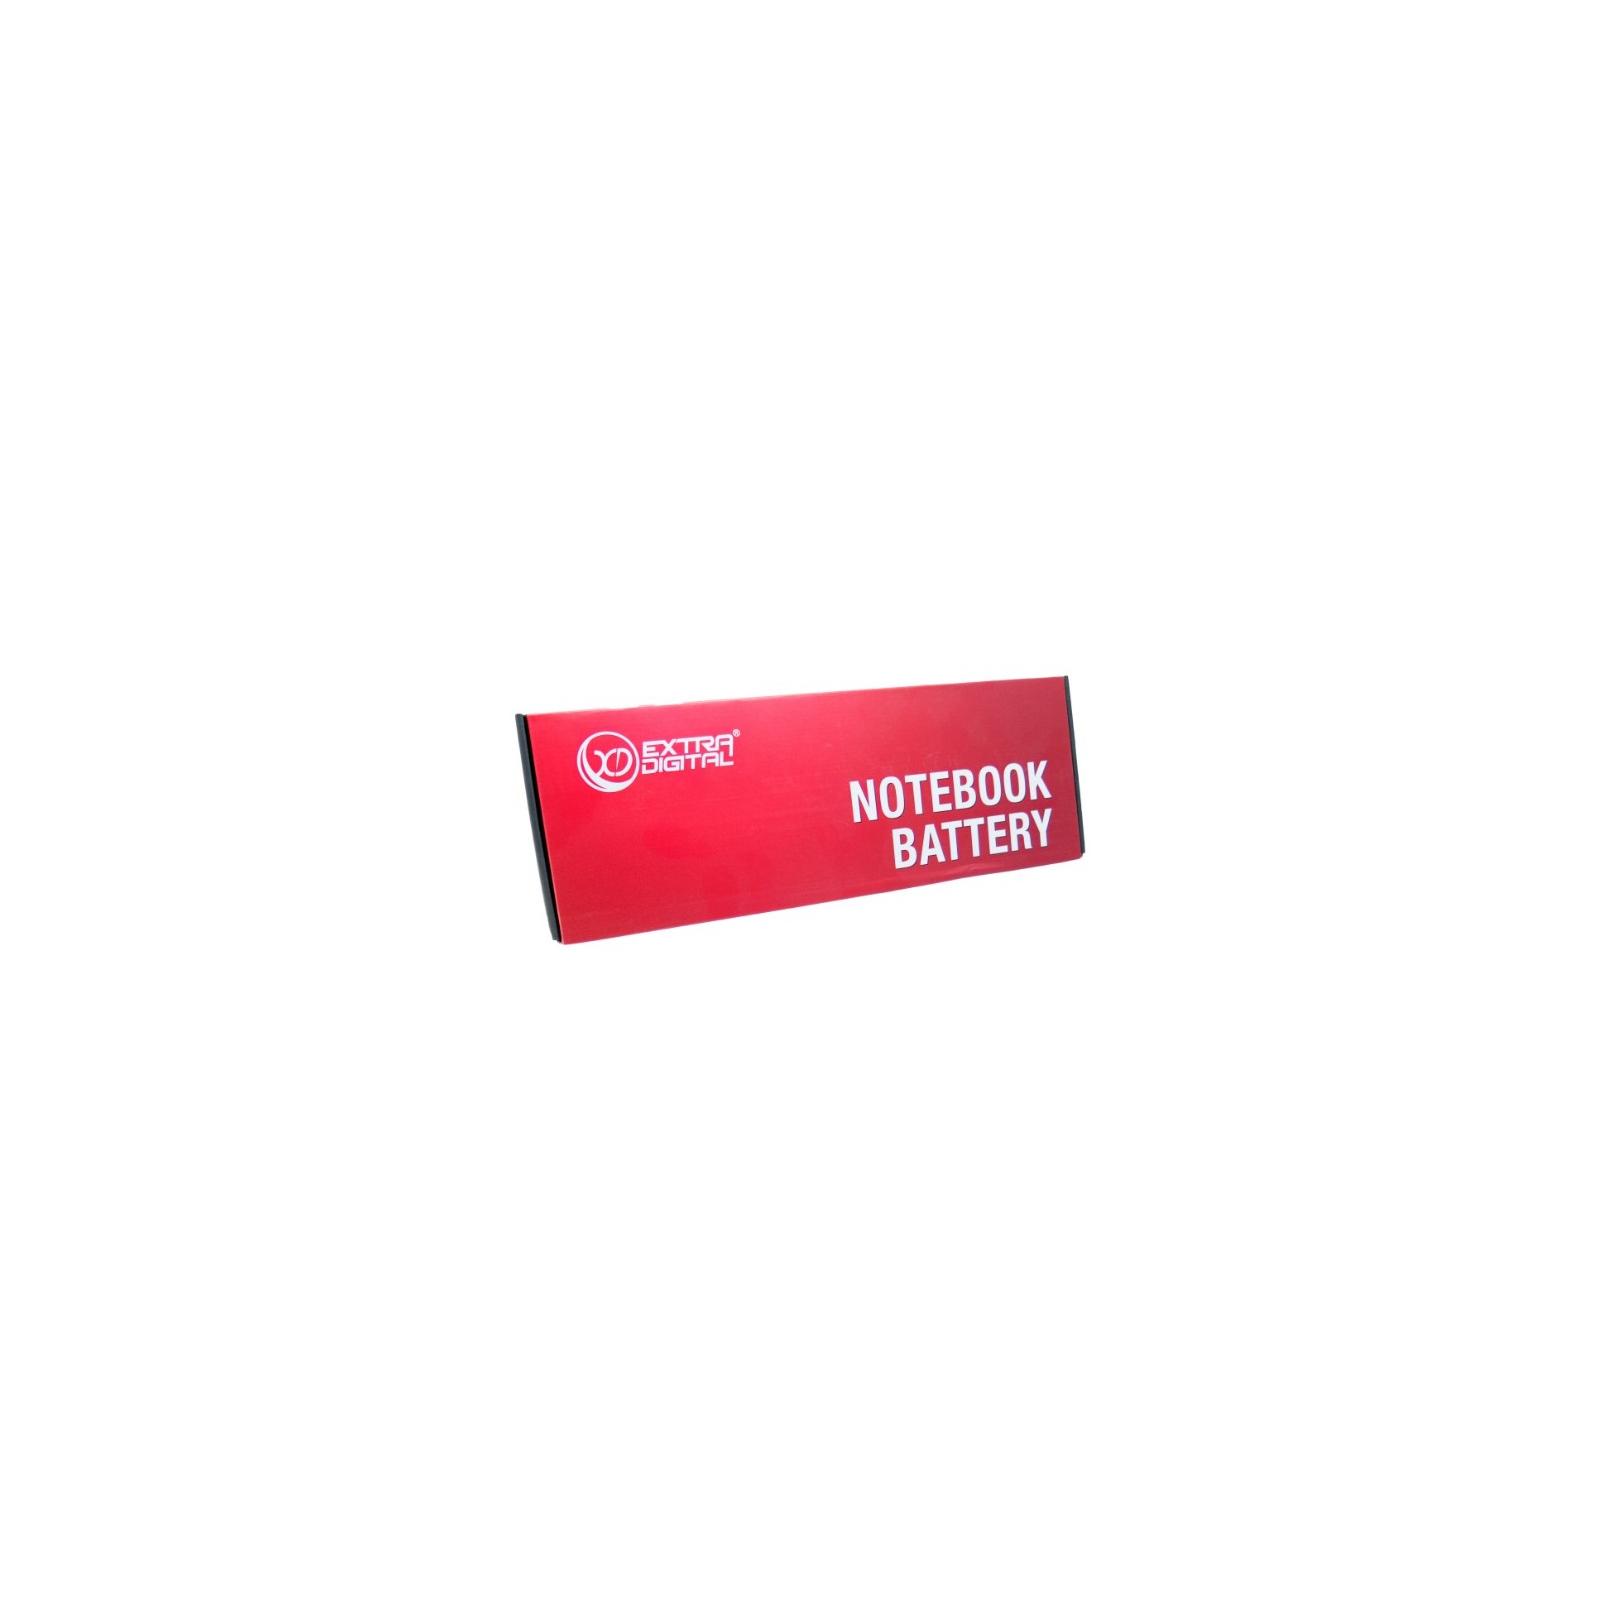 Аккумулятор для ноутбука Lenovo ThinkPad T430 10.8V, 5200mAh Extradigital (BNL4004) изображение 5